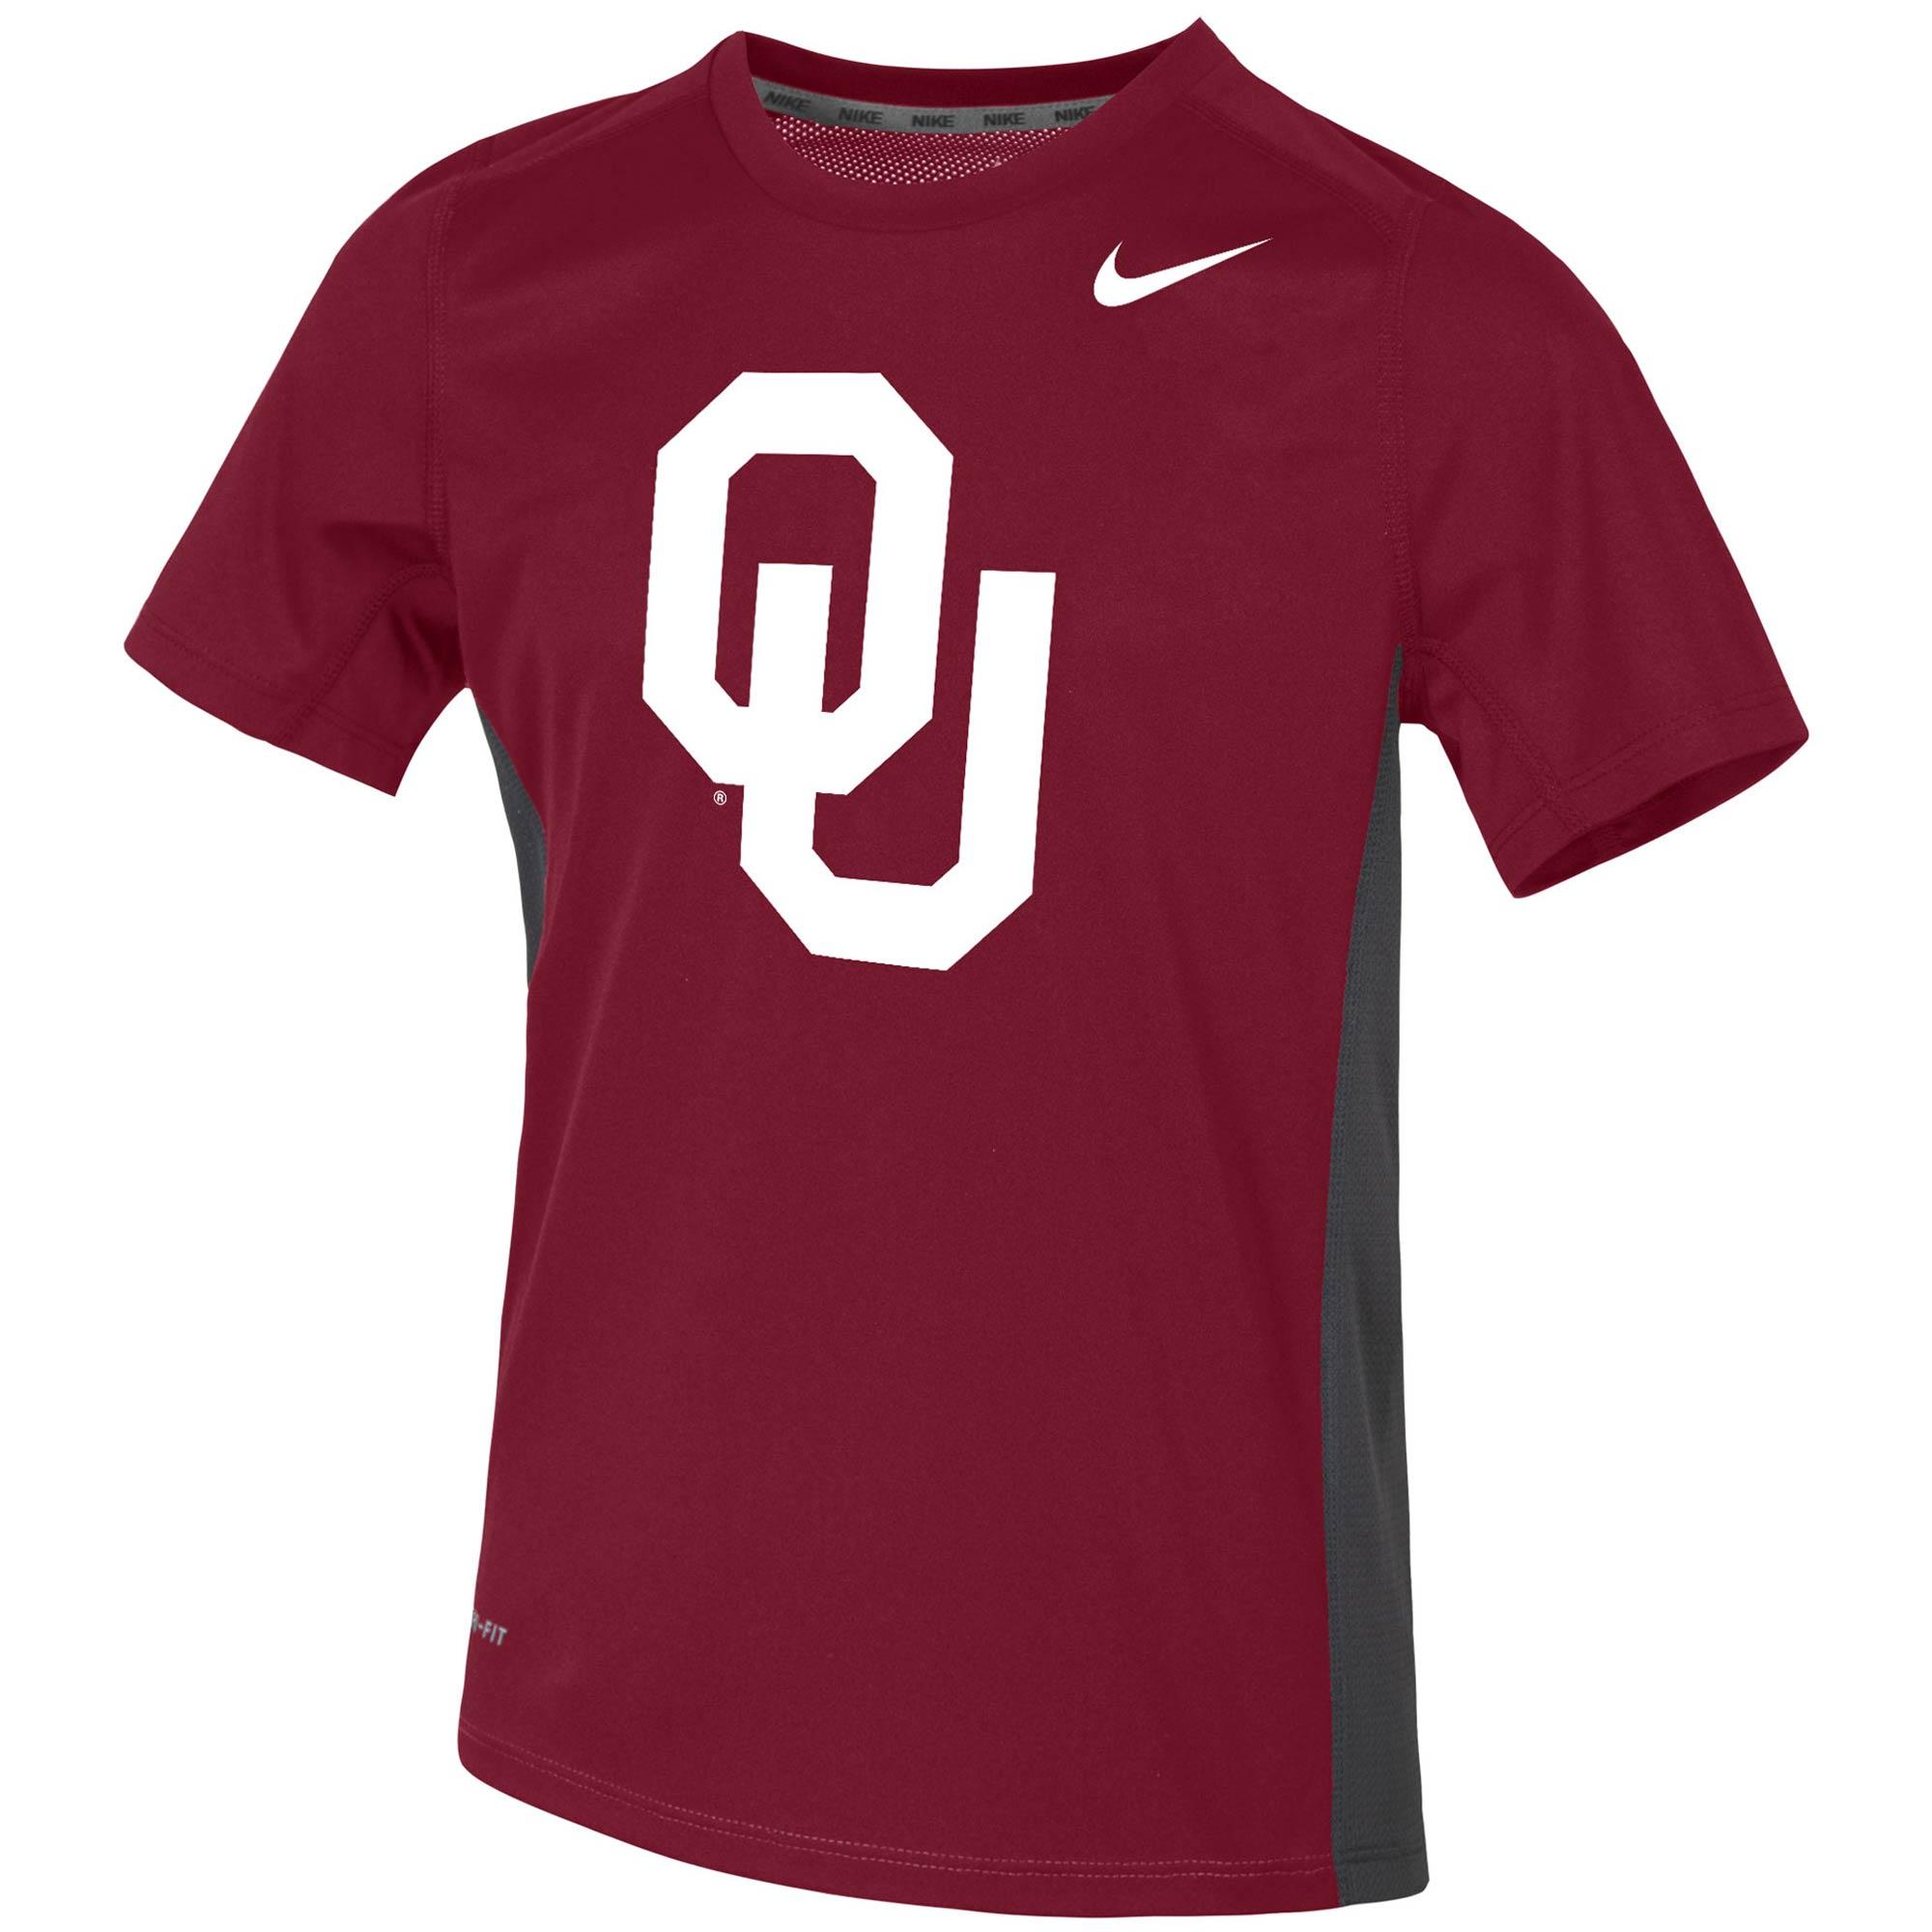 Oklahoma Sooners Team Shop - Walmart com